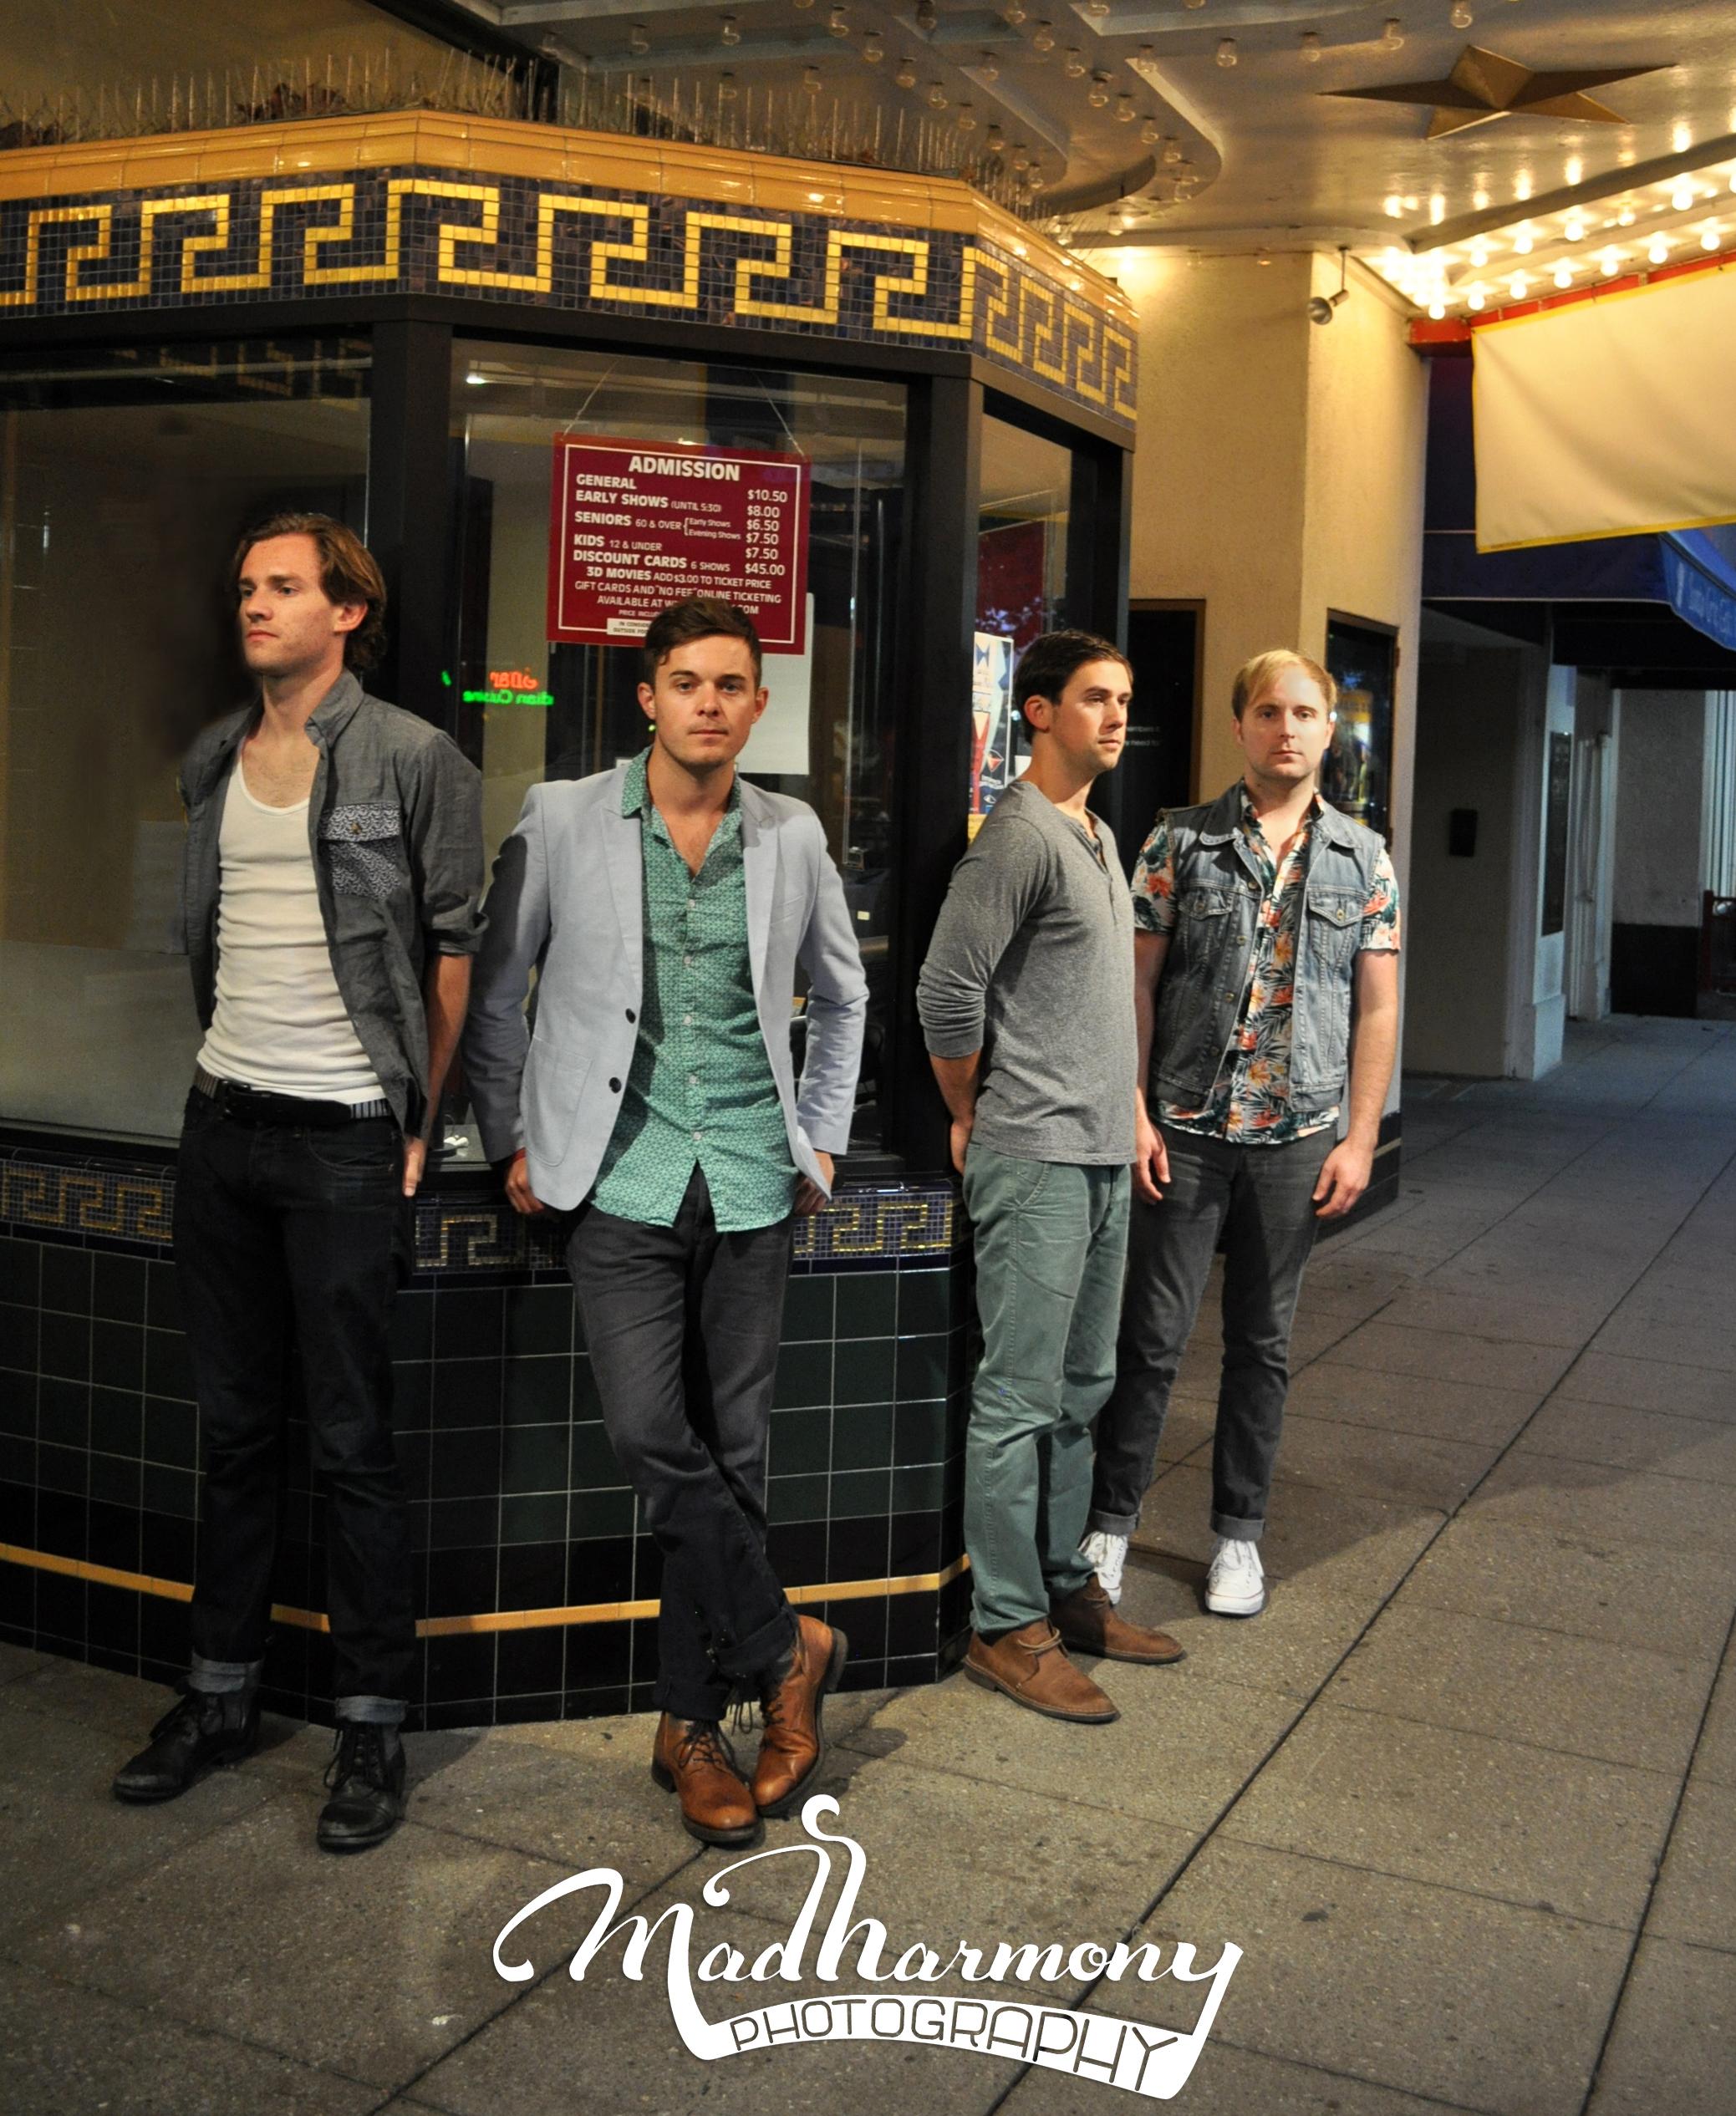 Tommy & The High Pilots / Downtown Santa Cruz 2014